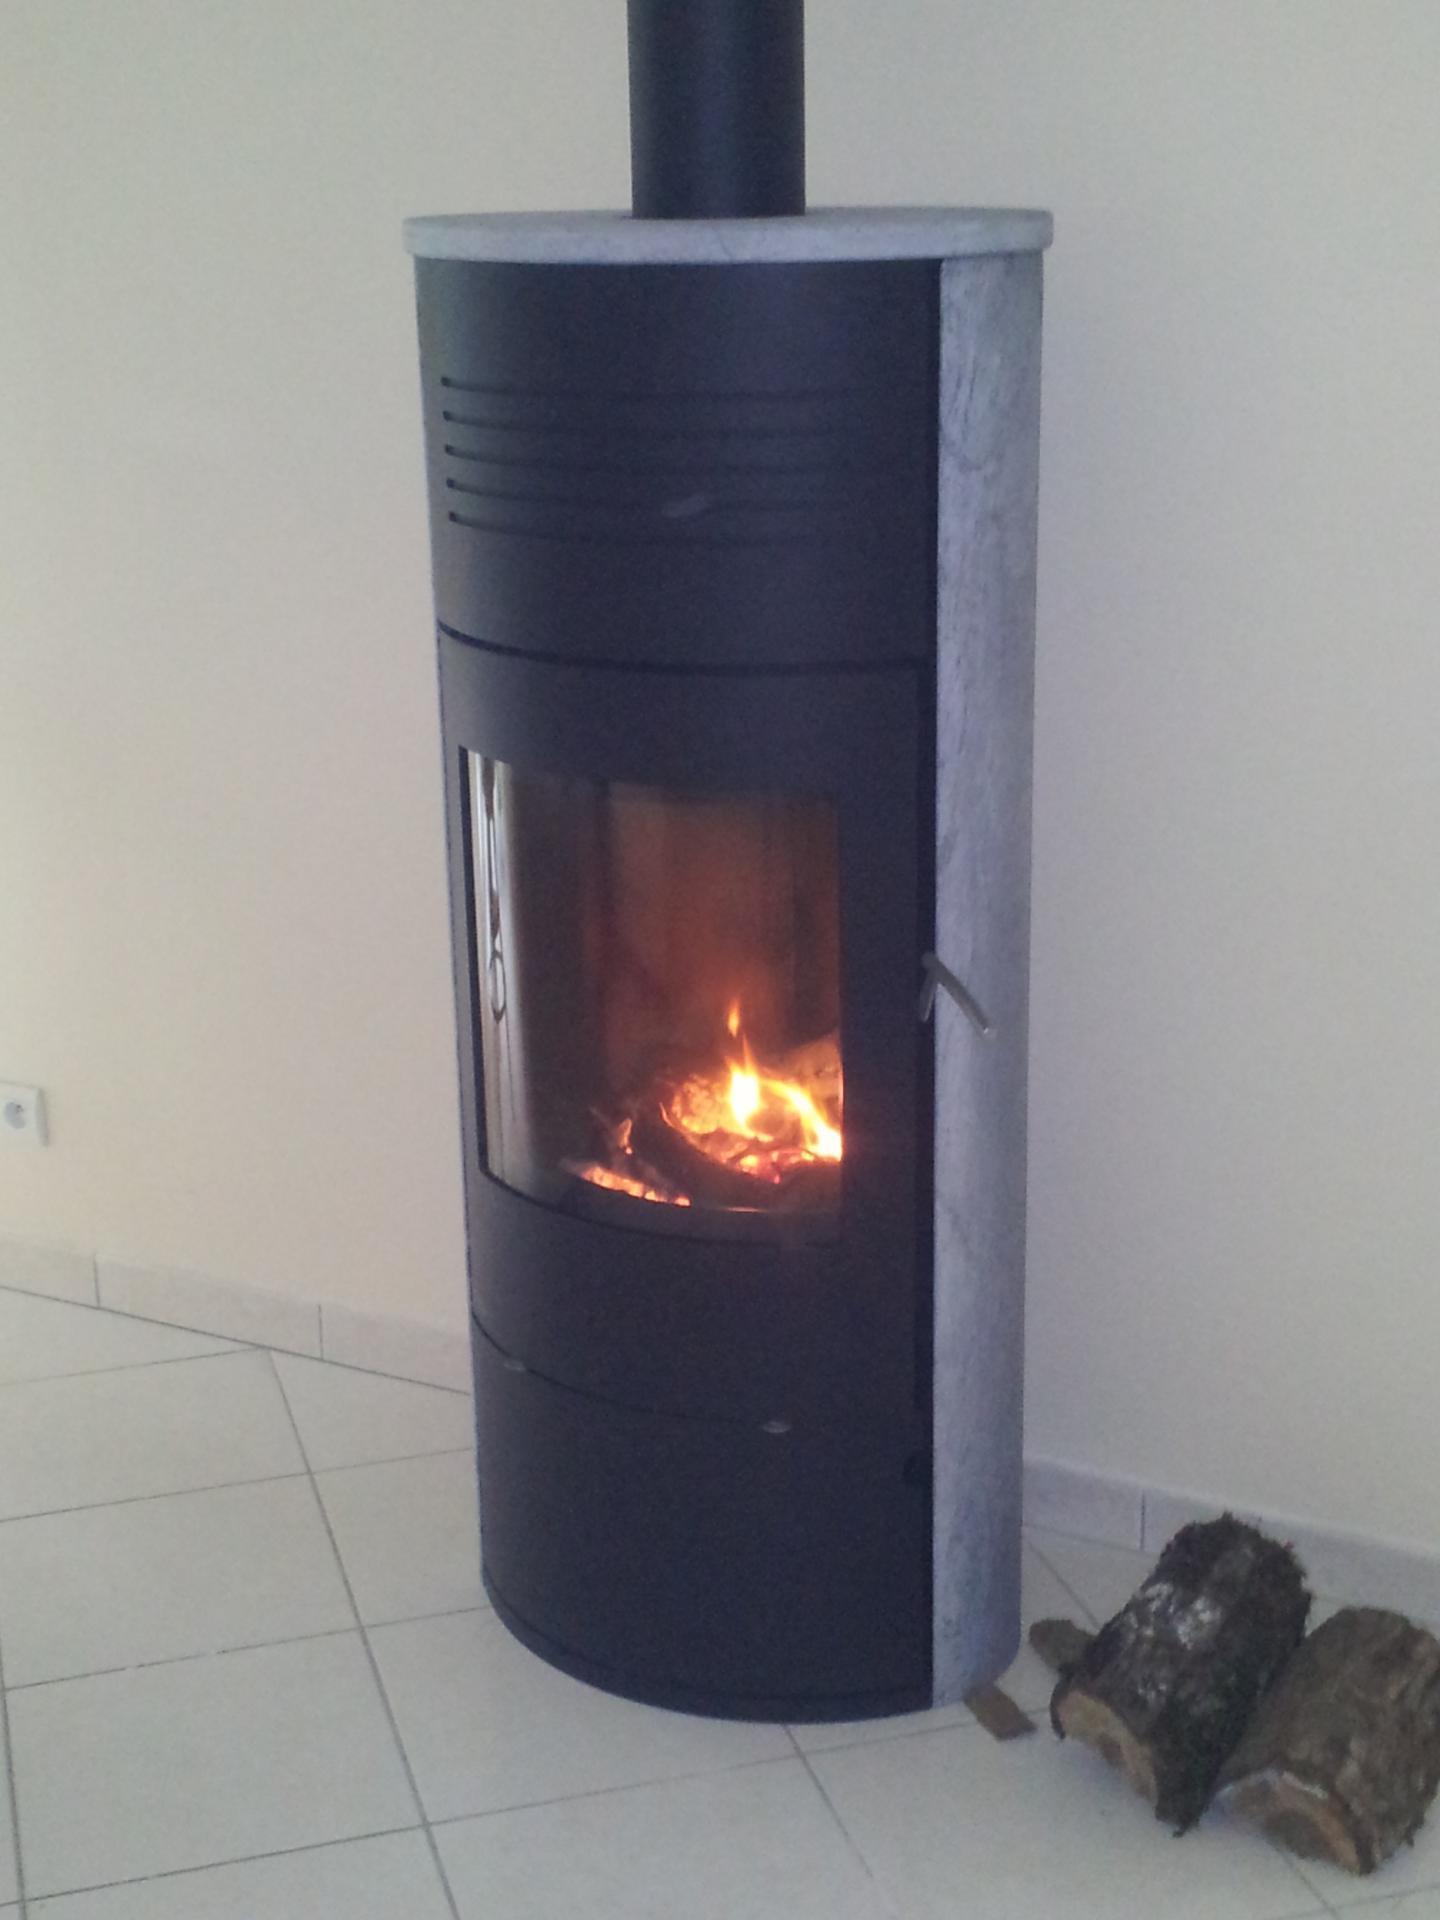 Poele A Bois Fonte Flamme - Poele A Bois Fonte Flamme u2013 Myqto com